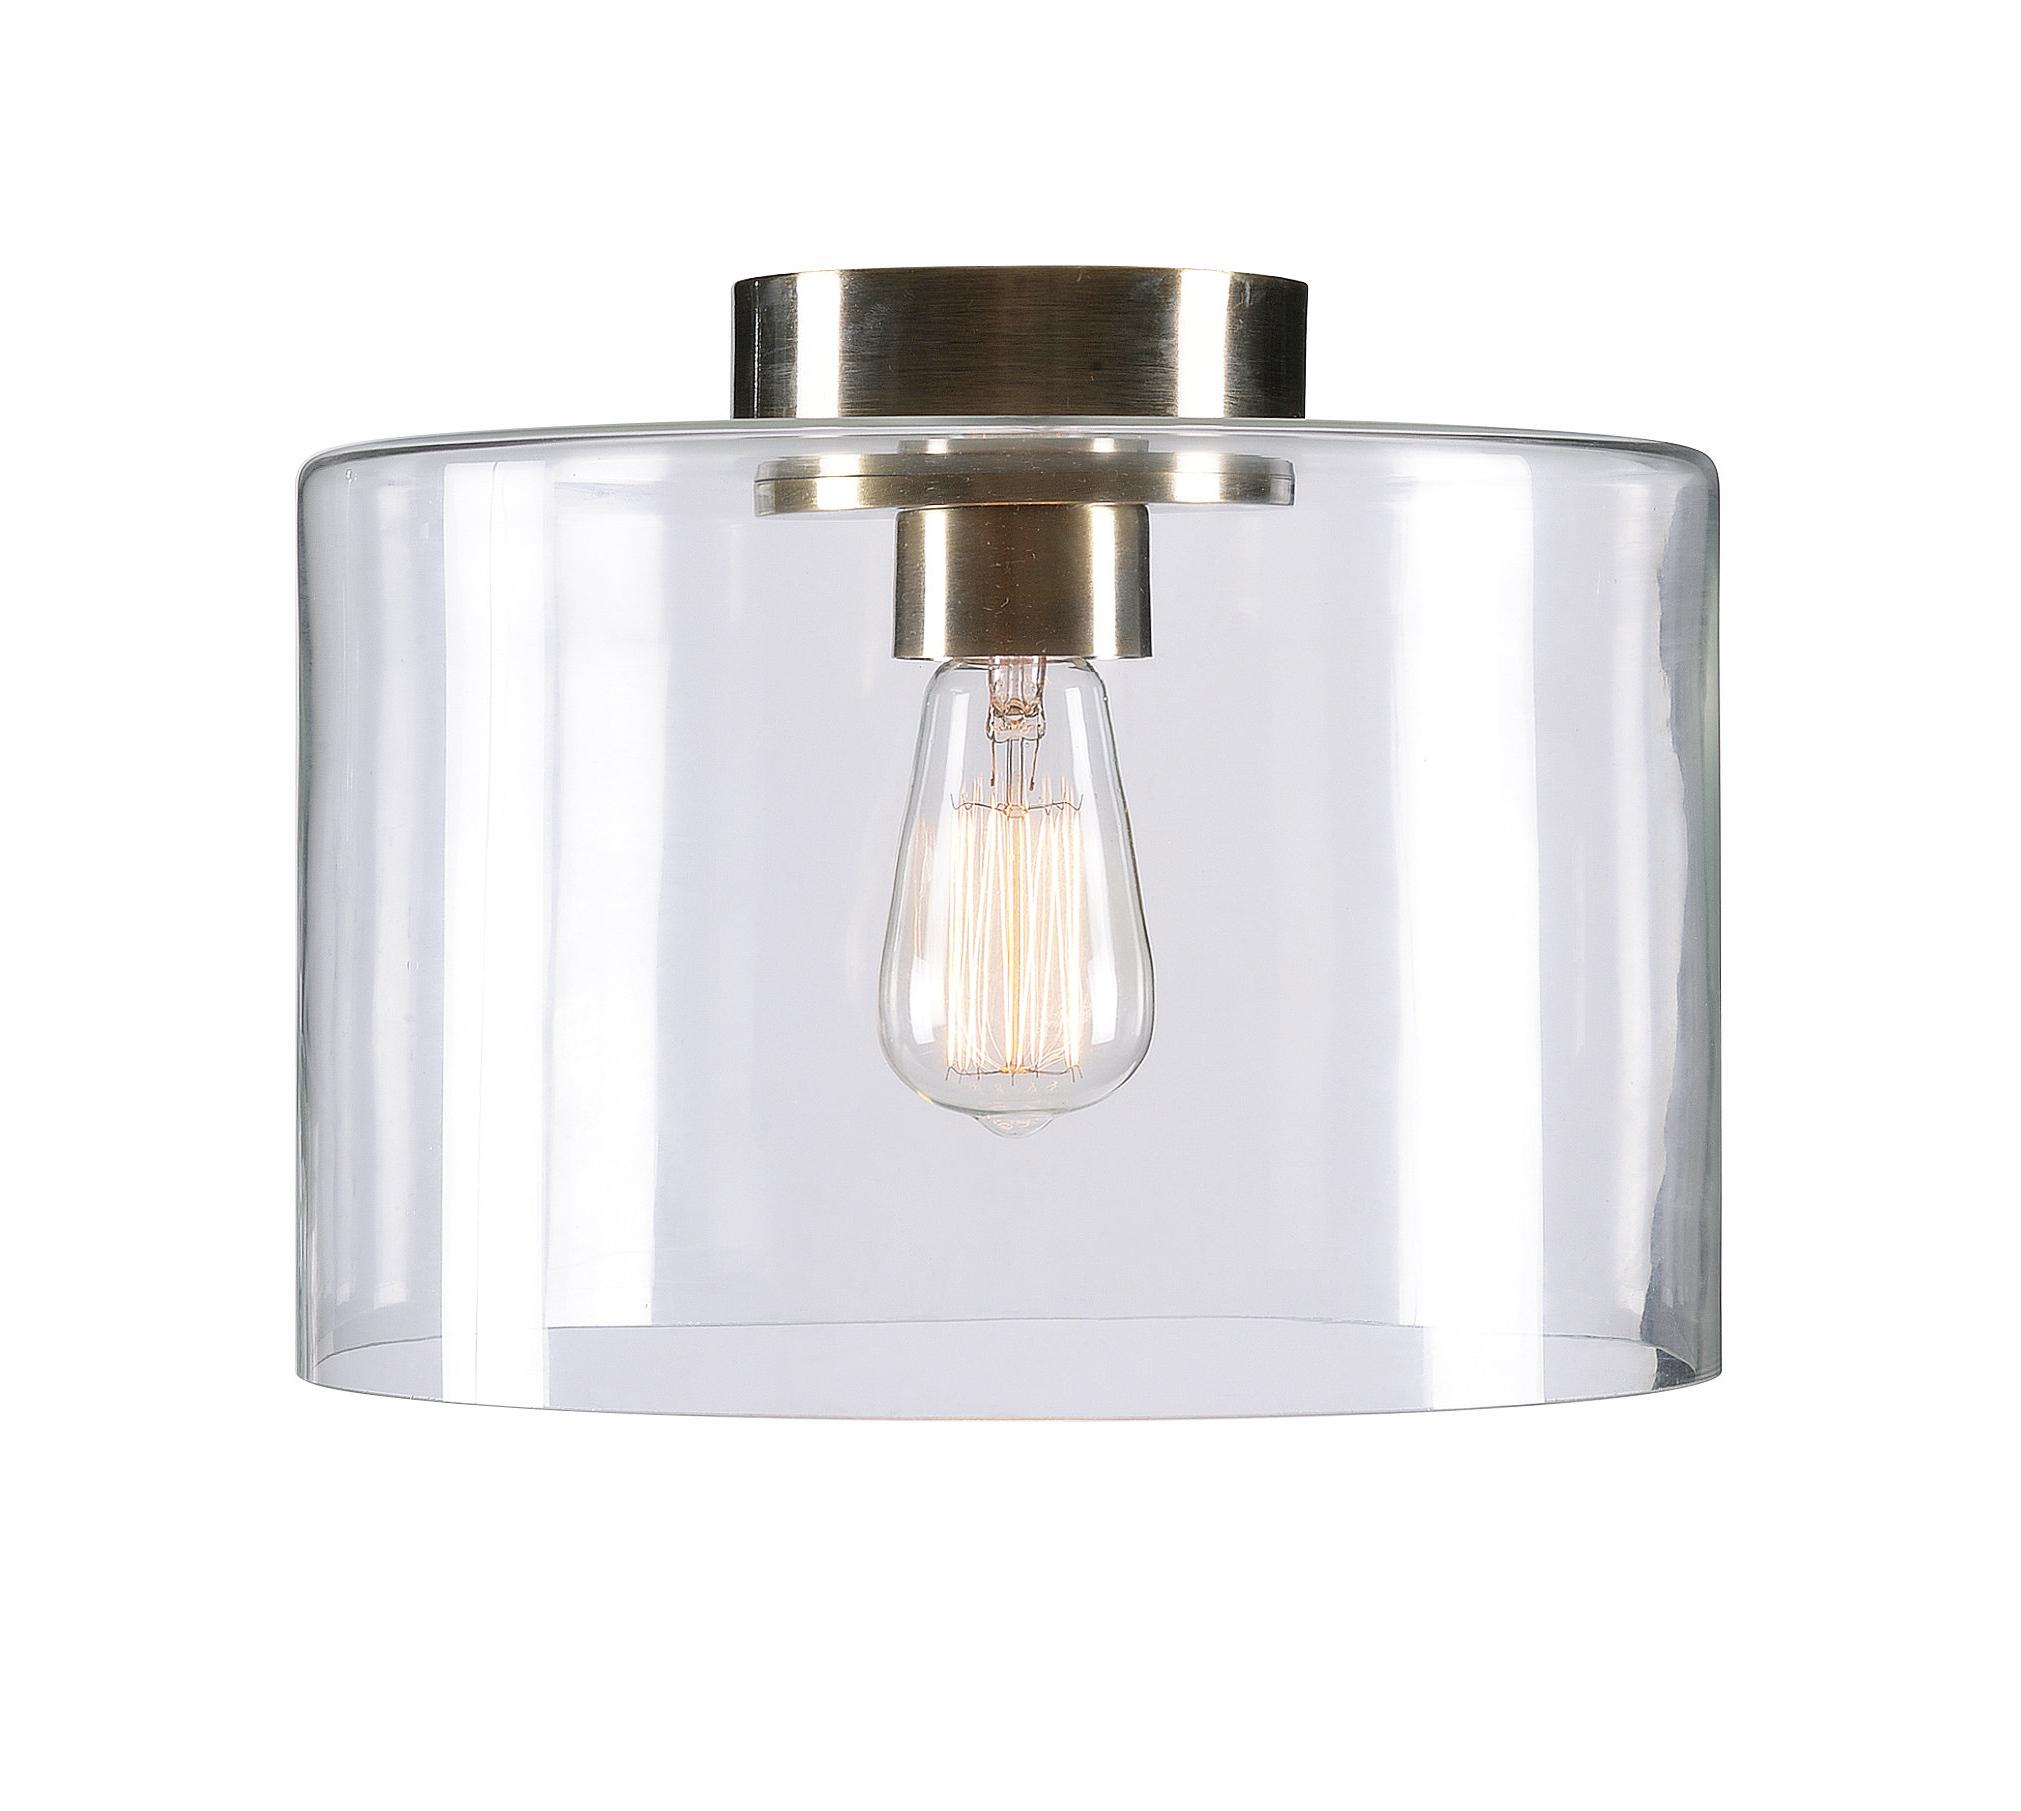 Clematite 1 Light Single Jar Pendants With 2019 Clematite 1 Light Flush Mount (View 24 of 25)